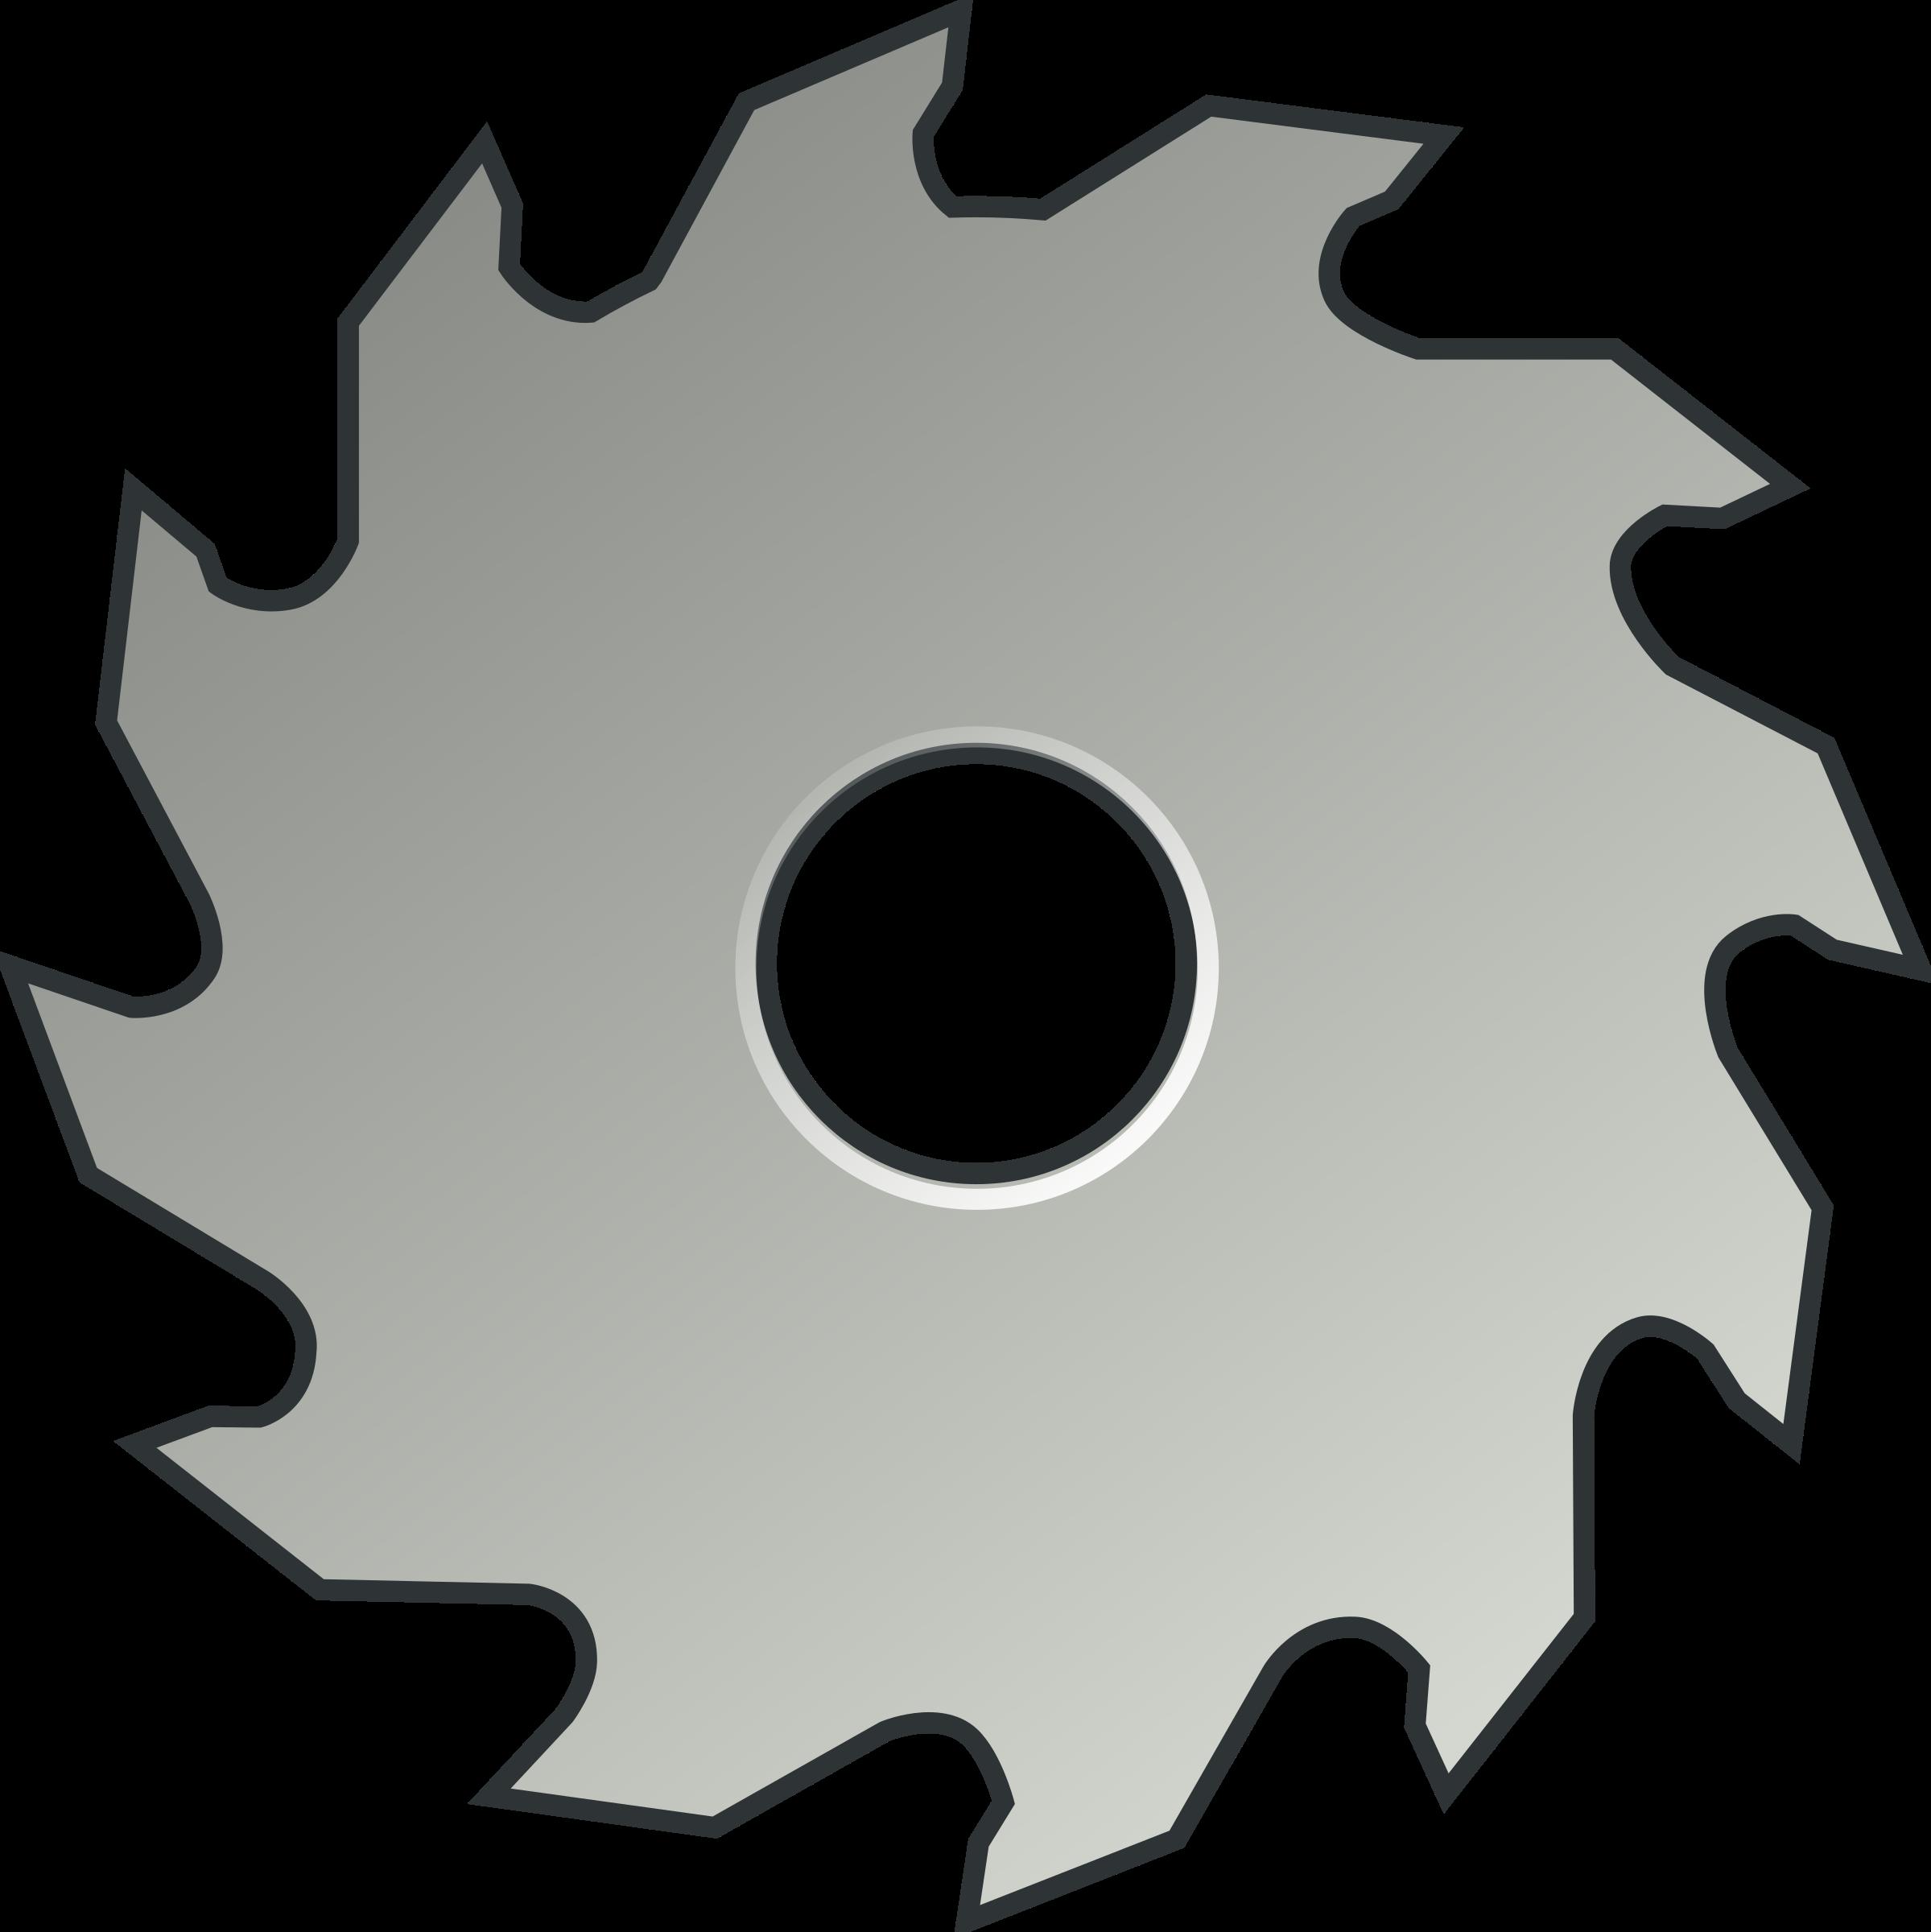 jpg free download Blade clipart table saw blade. Circular saws clip art.